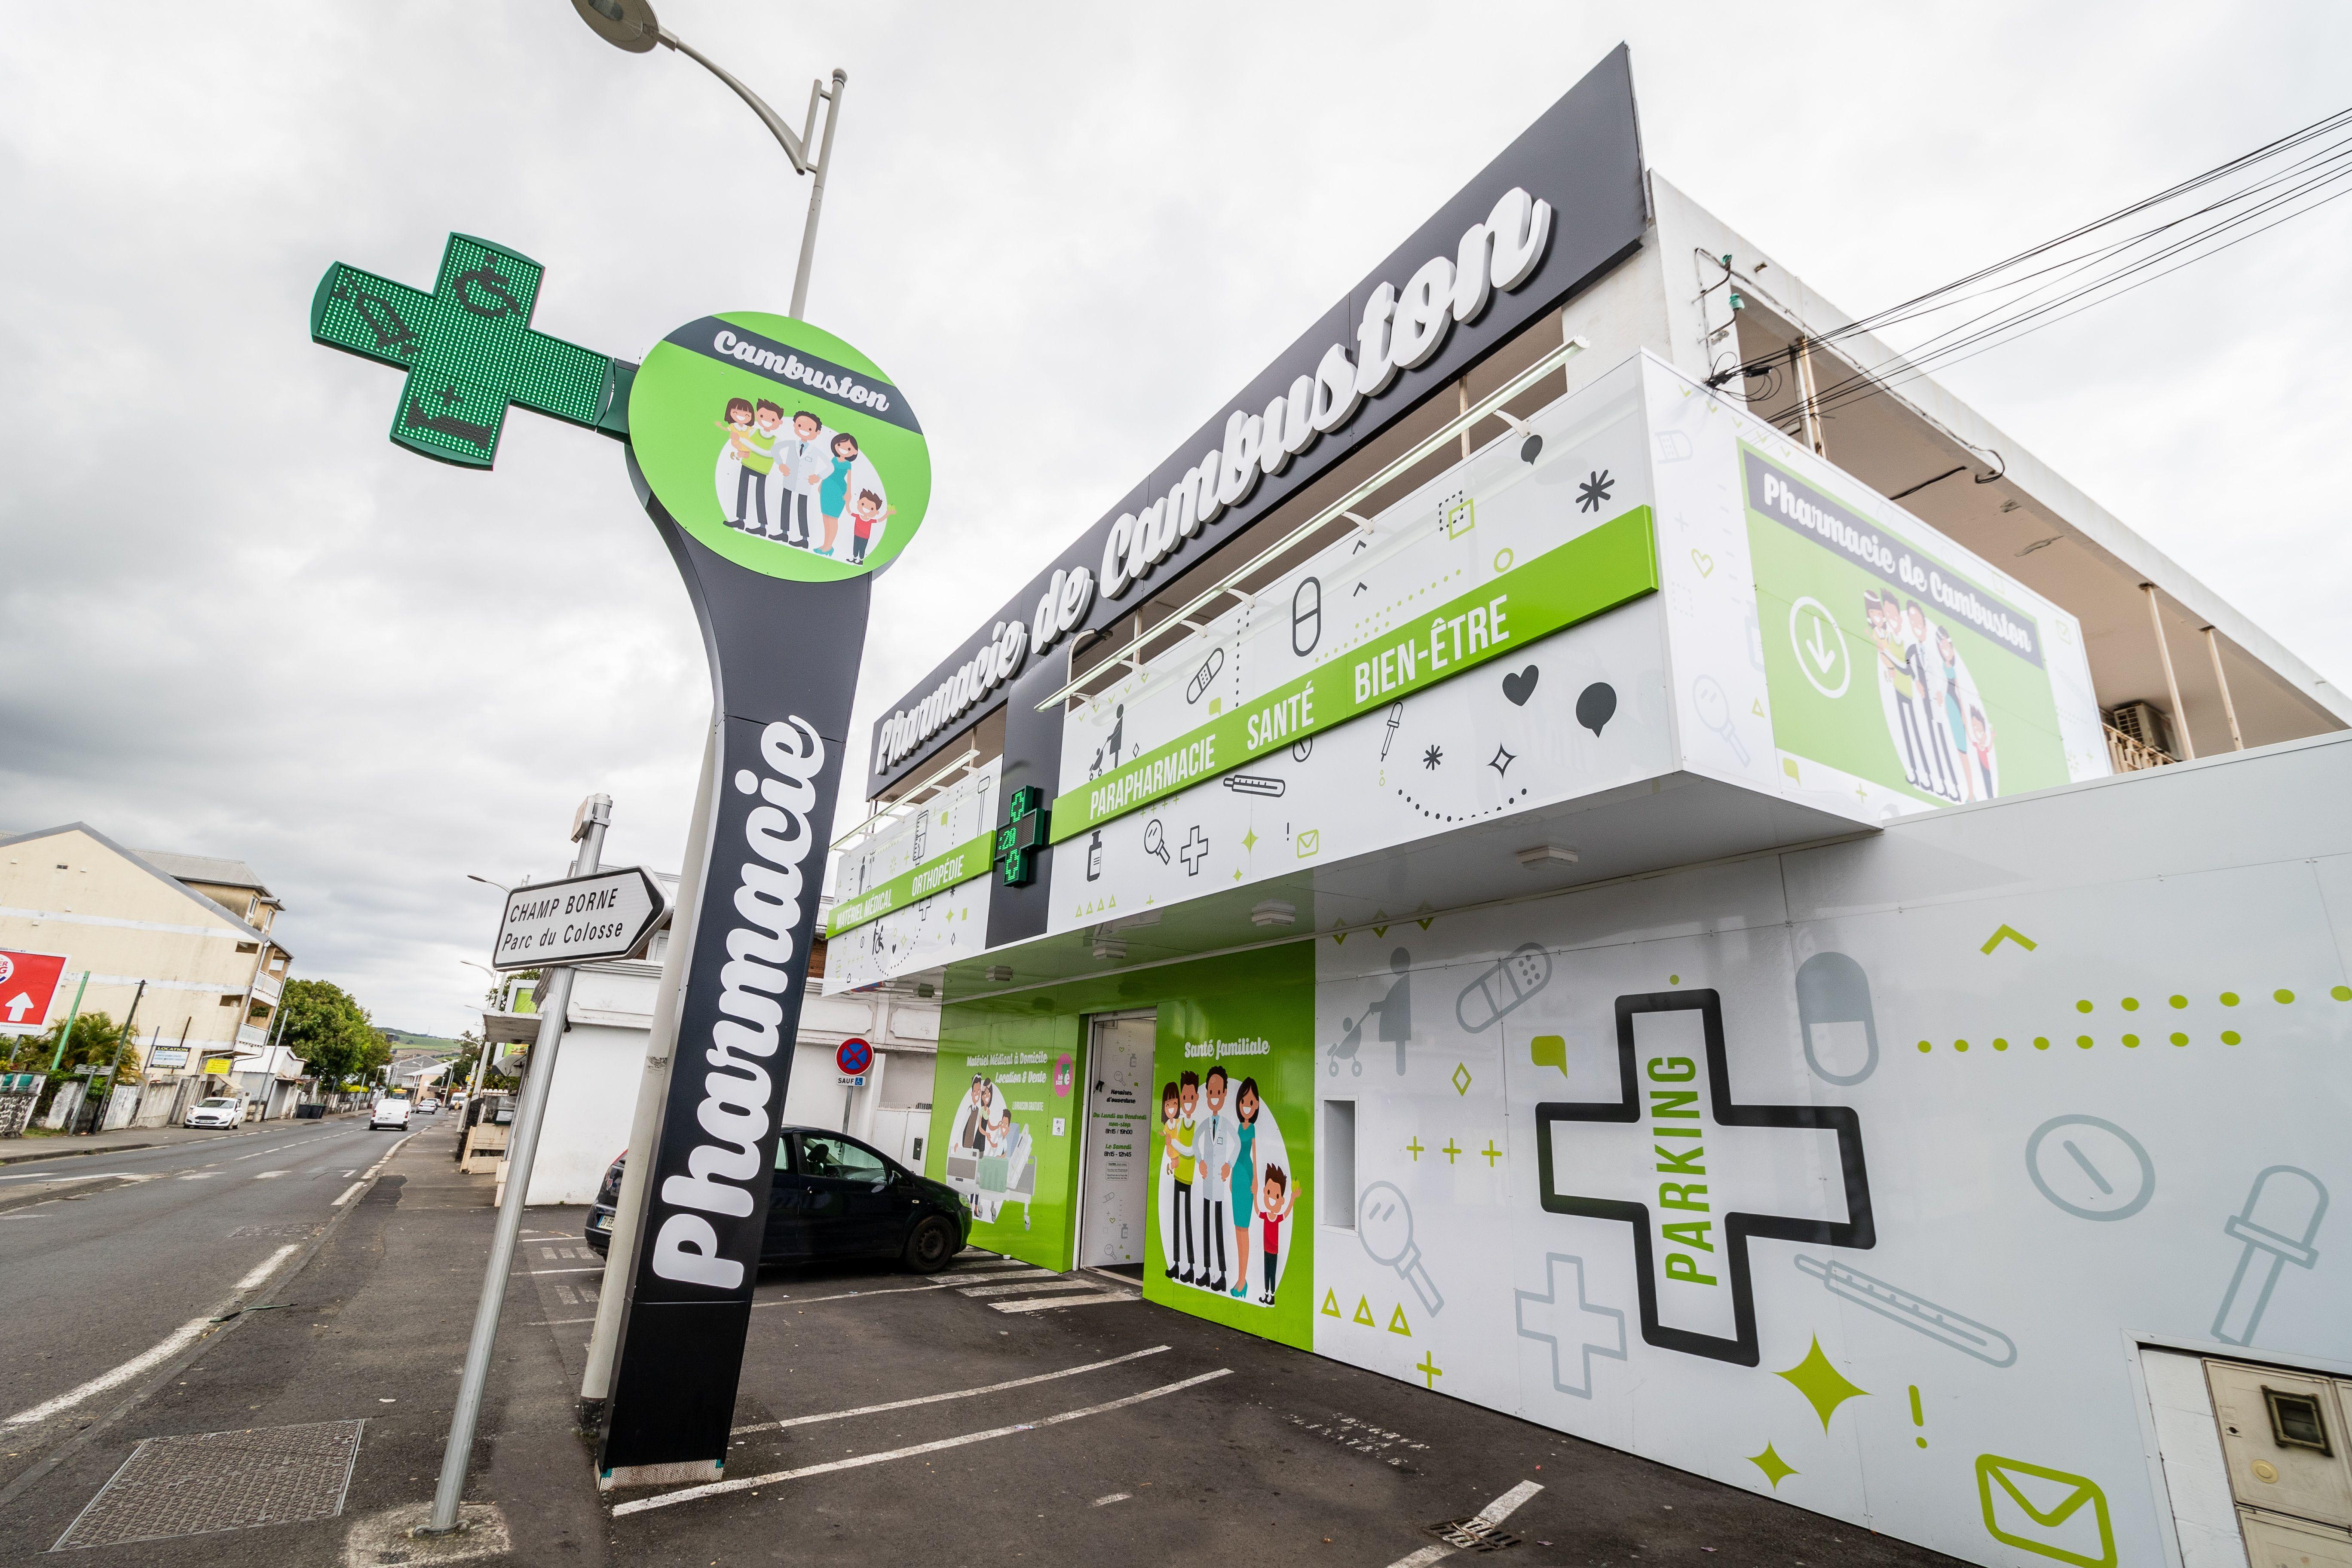 Facade Pharmacie De Cambuston Pharmacie Sante Bien Etre Bien Etre